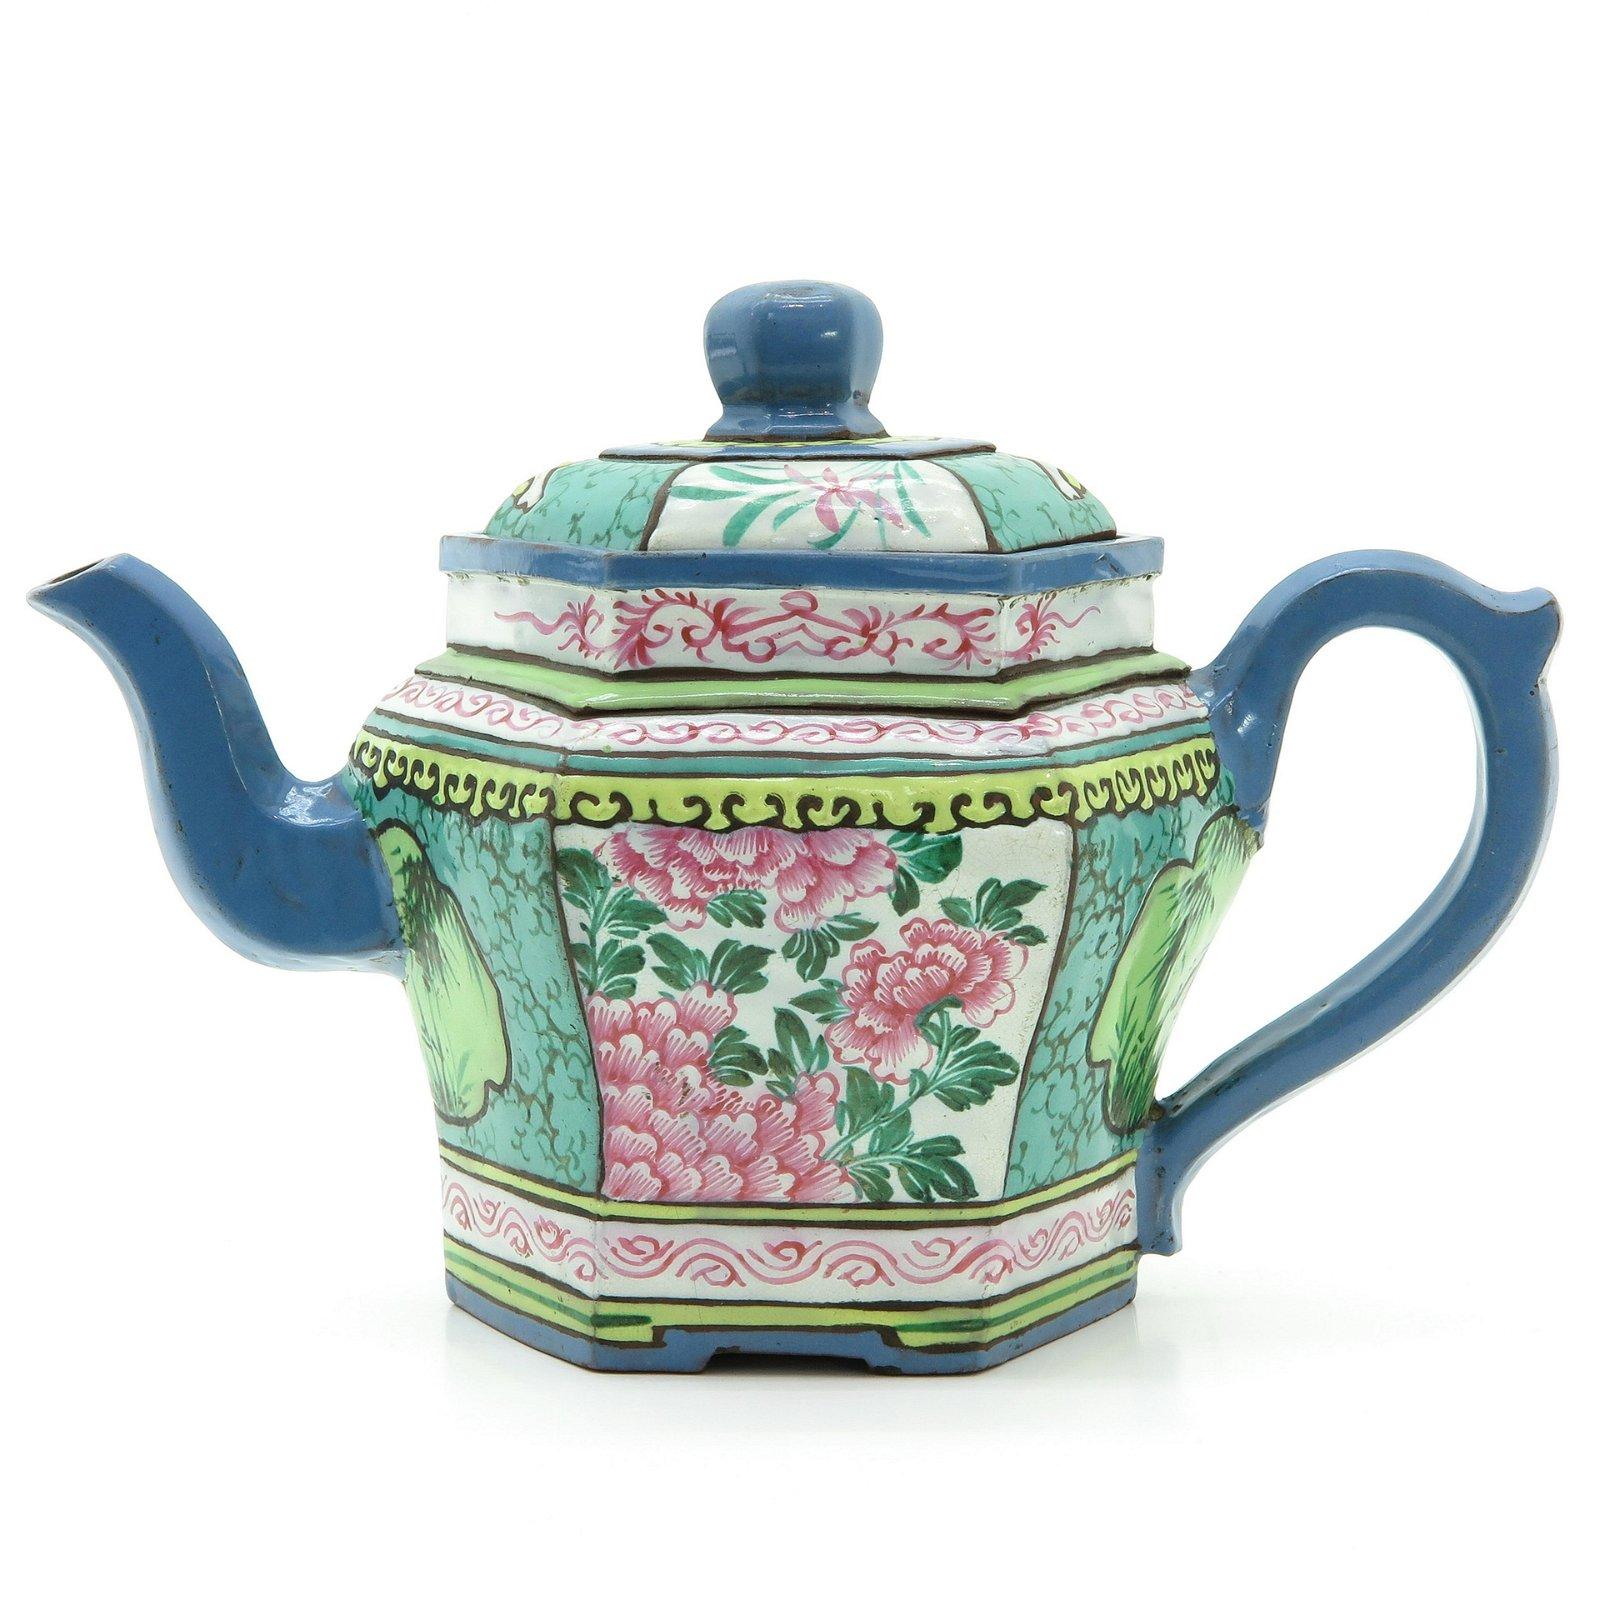 An Enamel Yixing Teapot